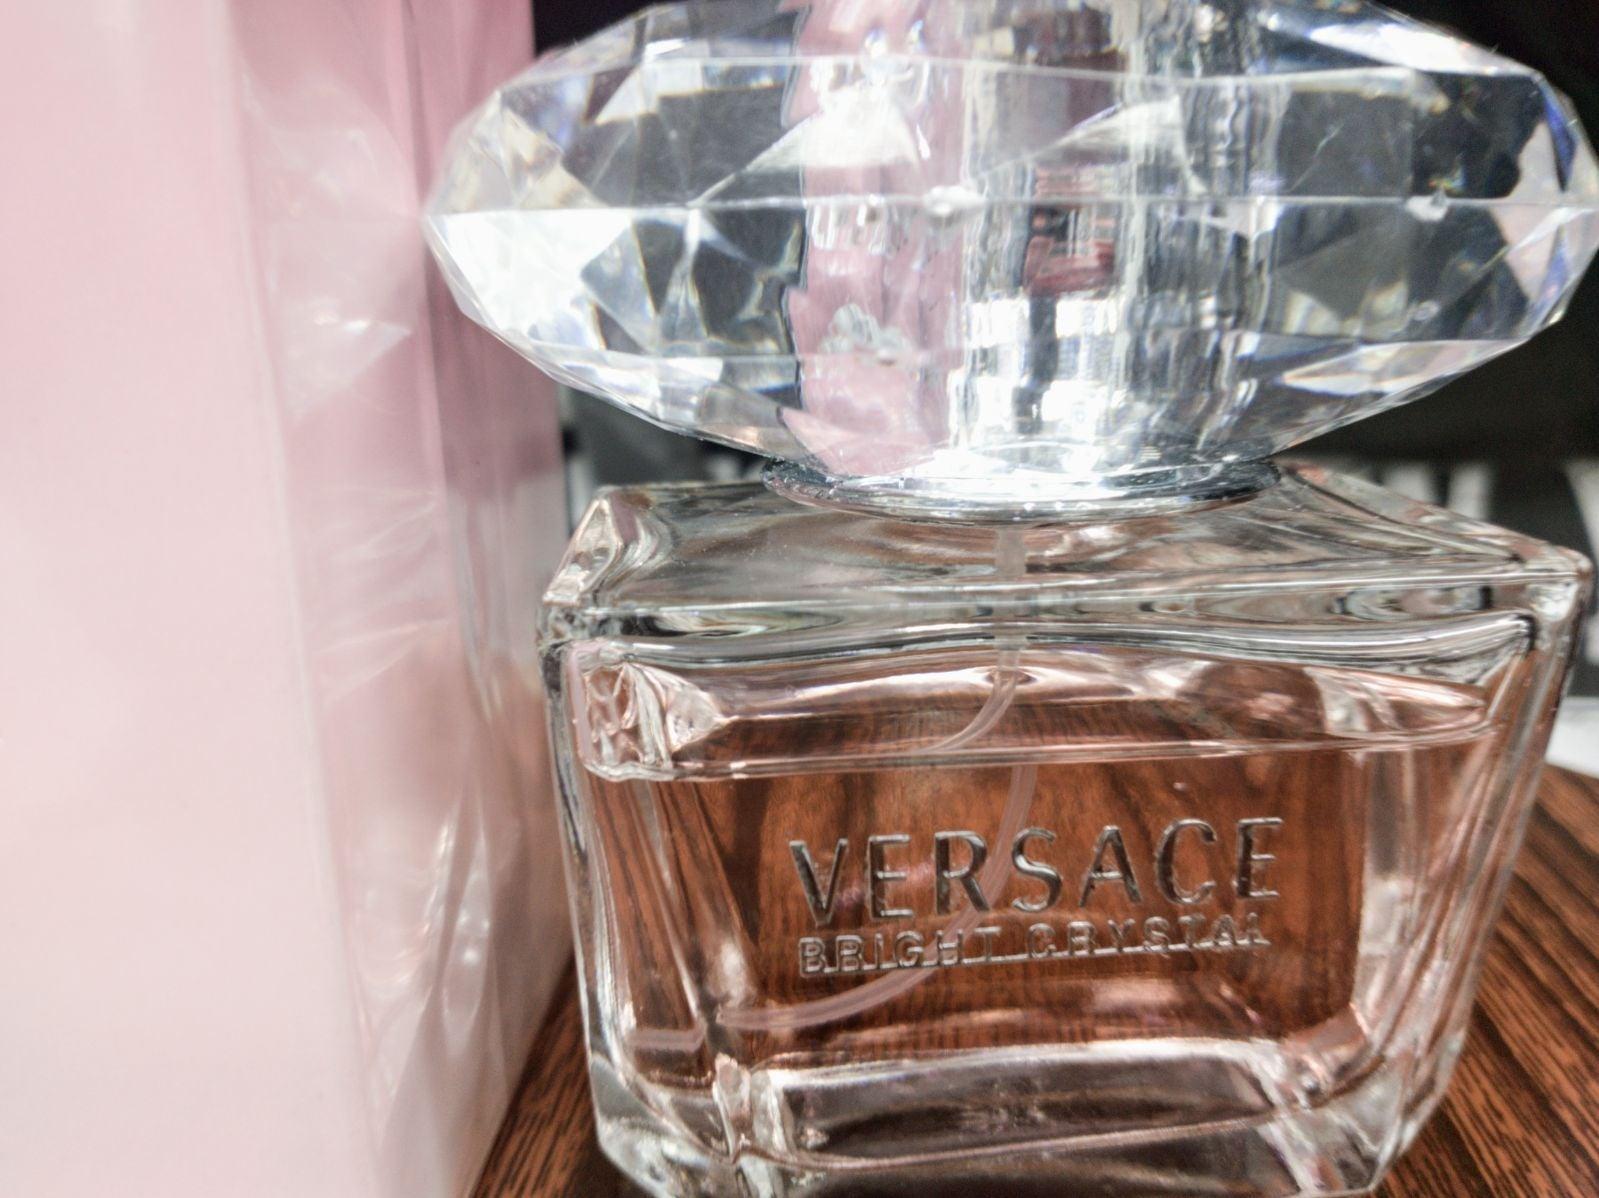 VERSACE BRIGHT CRYSTAL Perfume